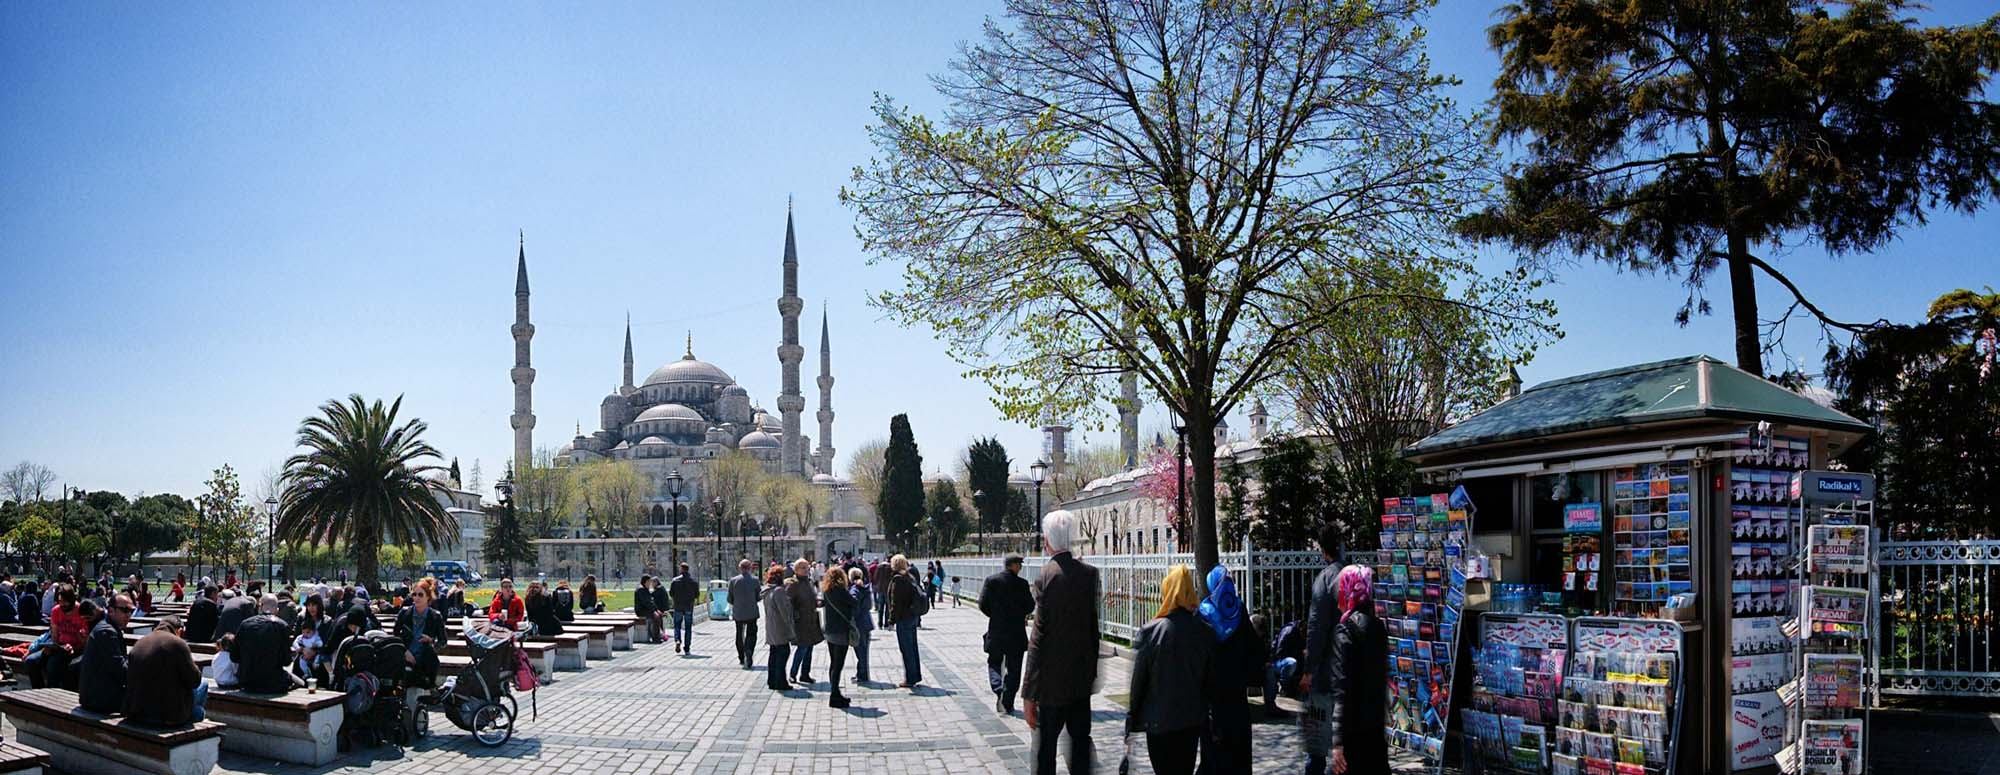 Istanbul bluemosque